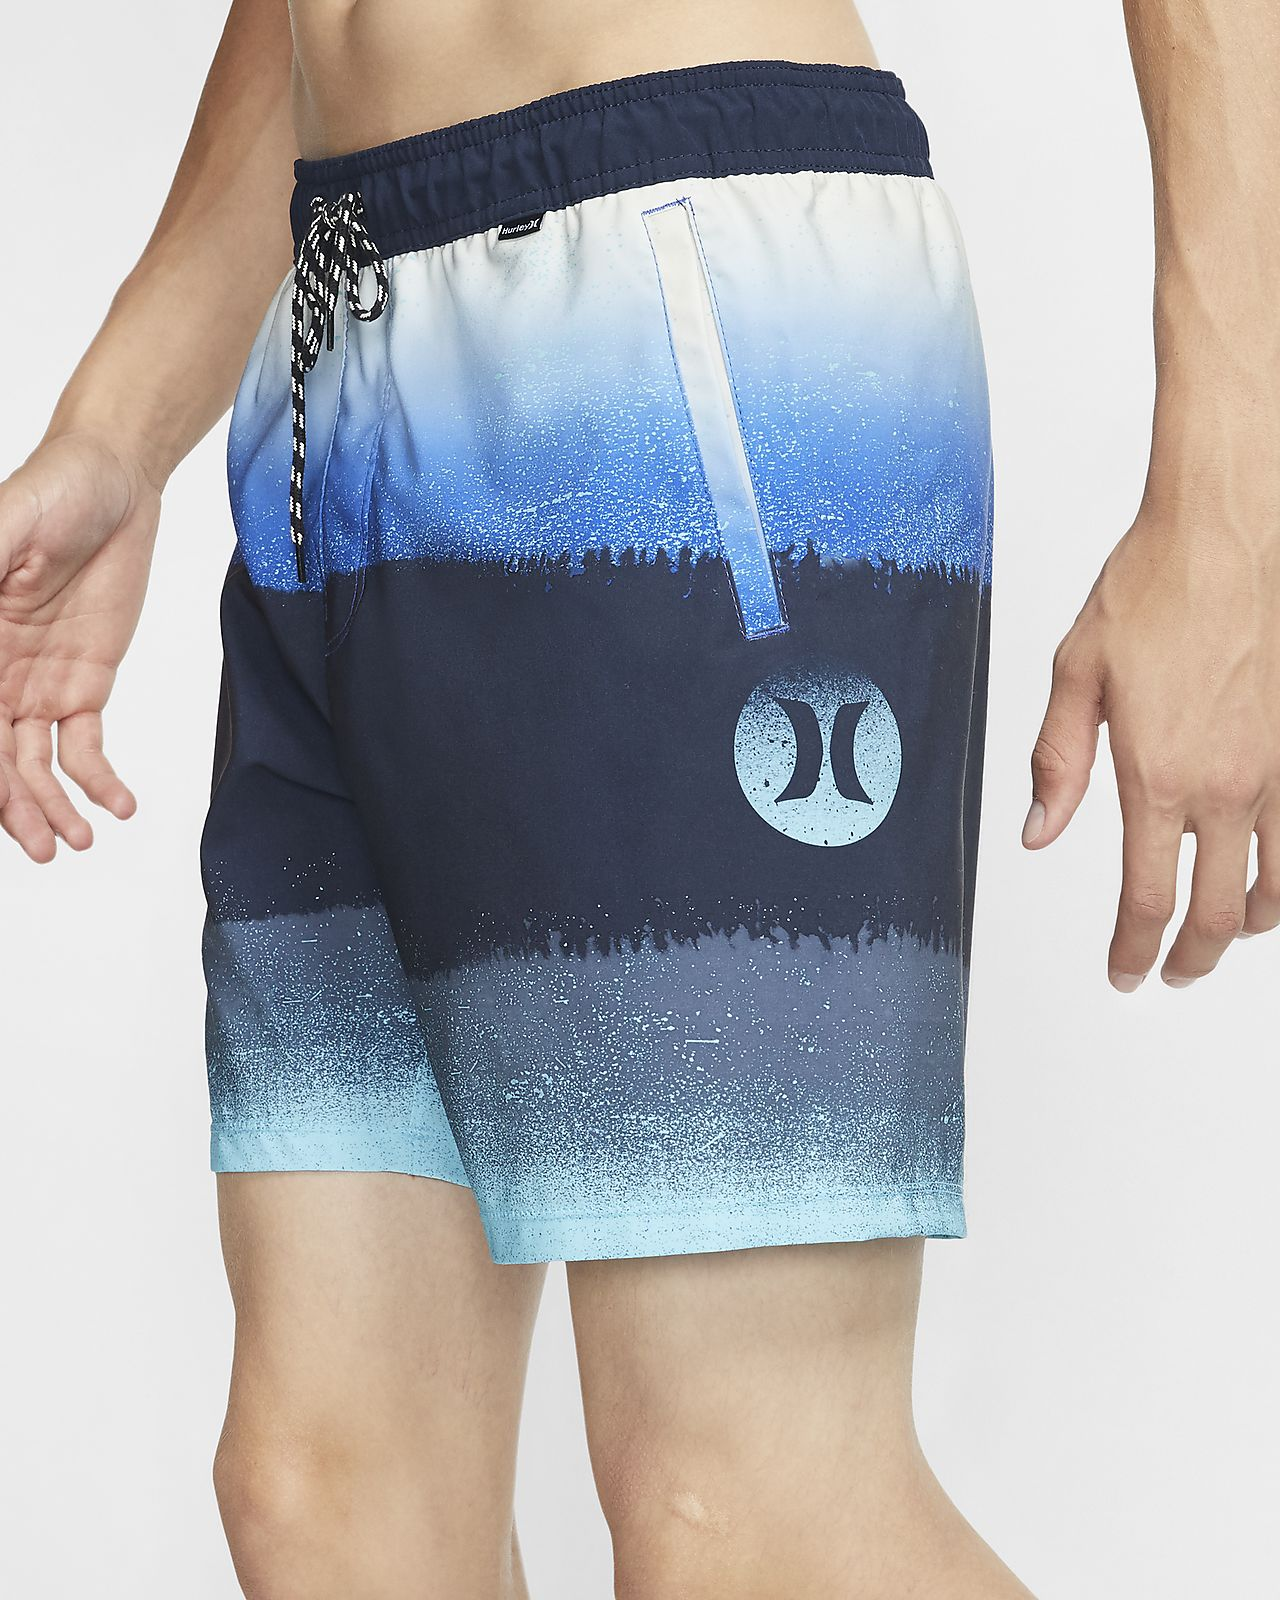 Hurley Phantom Sunset Herren-Boardshorts (ca. 43 cm)